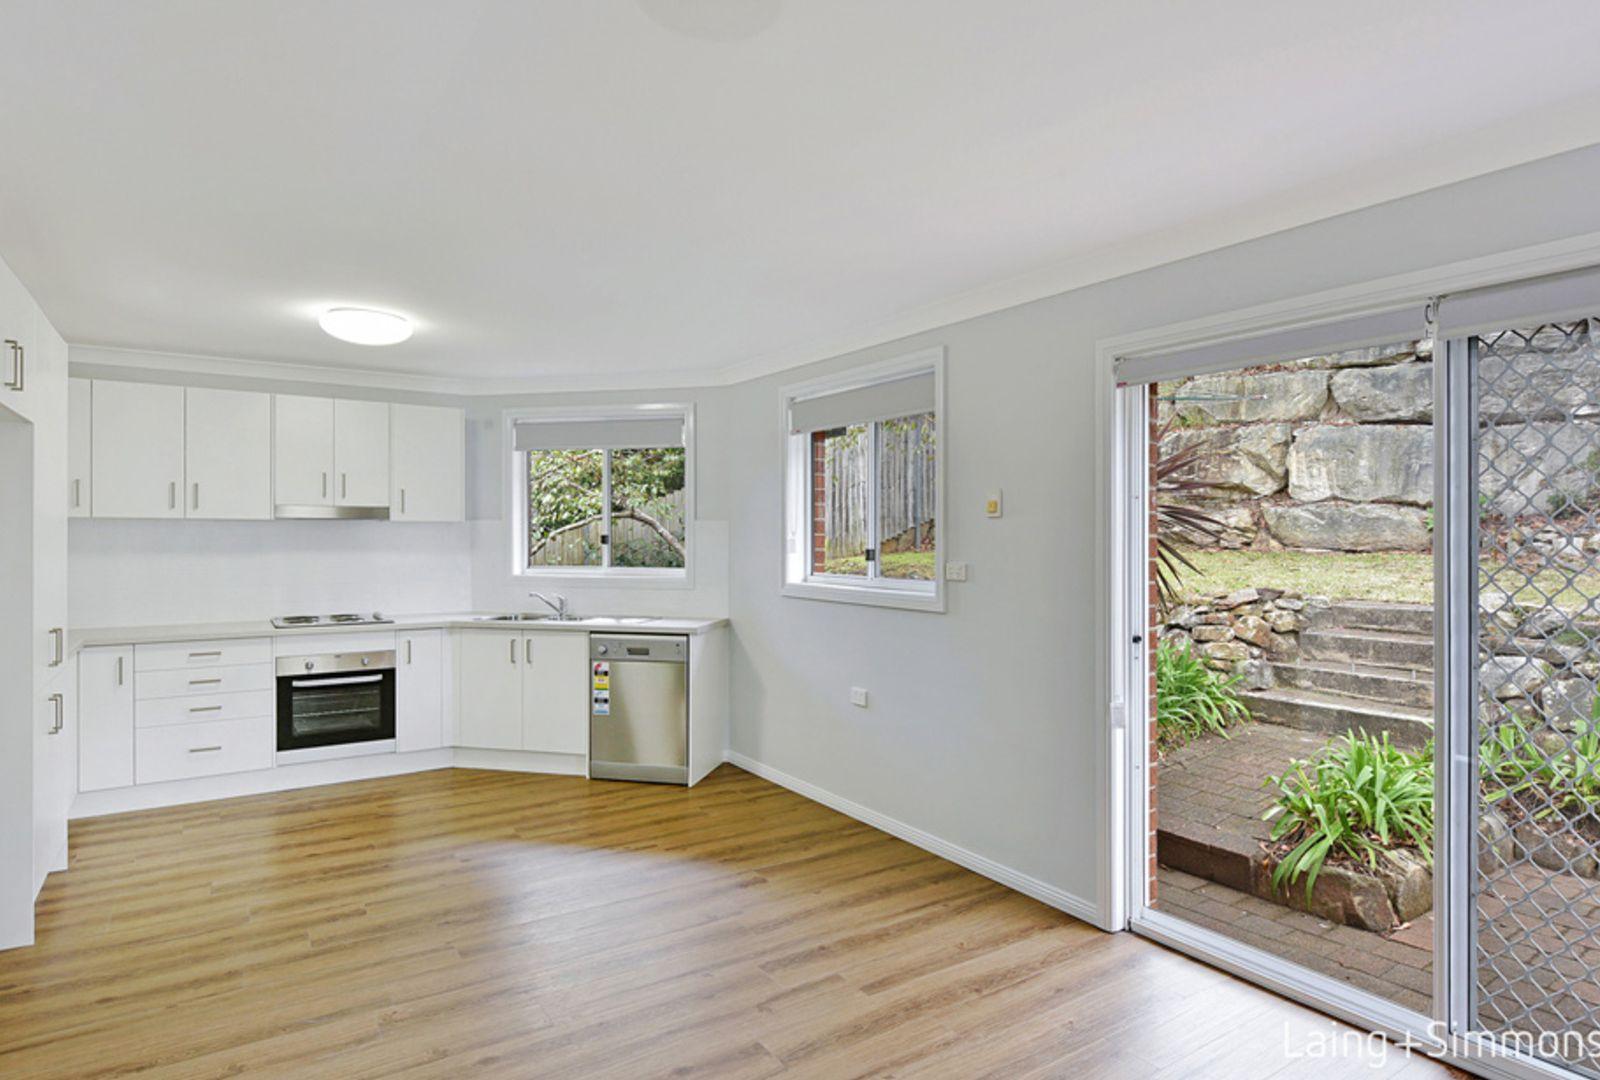 1/17 Jaranda Street, Berowra NSW 2081, Image 1